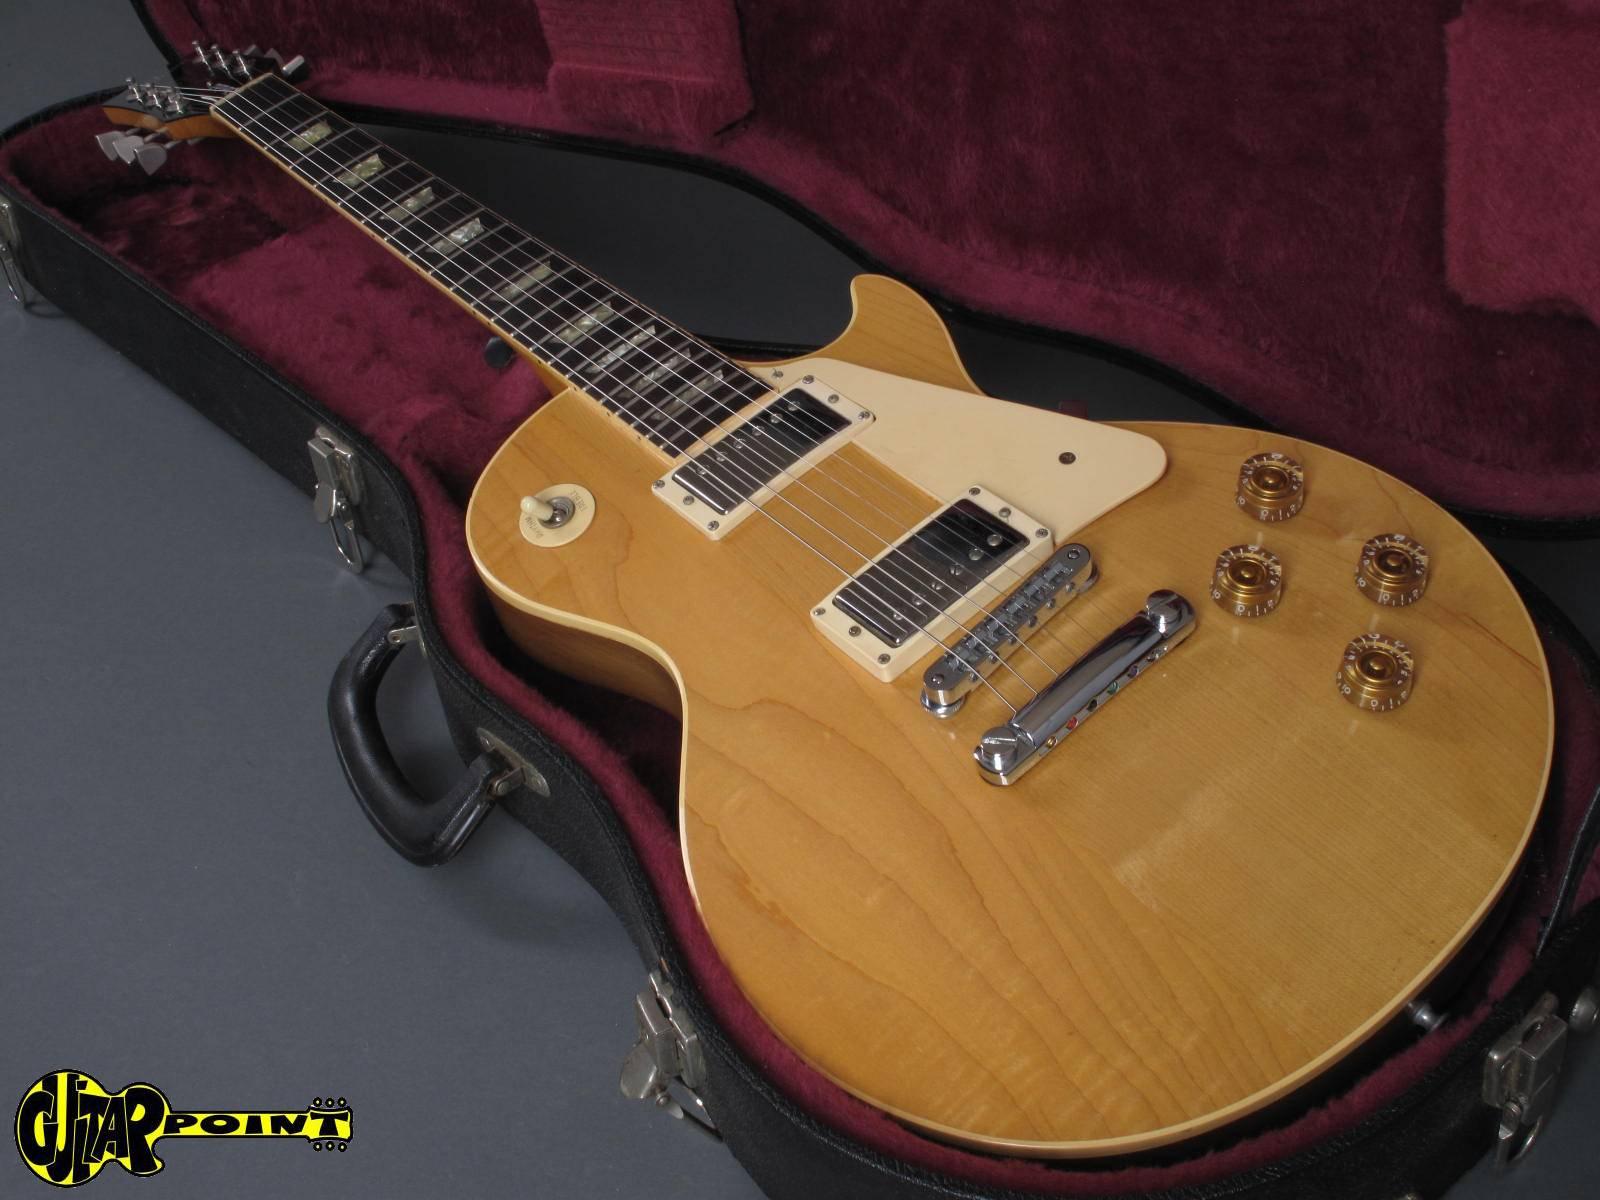 gibson les paul standard 1978 natural guitar for sale guitarpoint. Black Bedroom Furniture Sets. Home Design Ideas